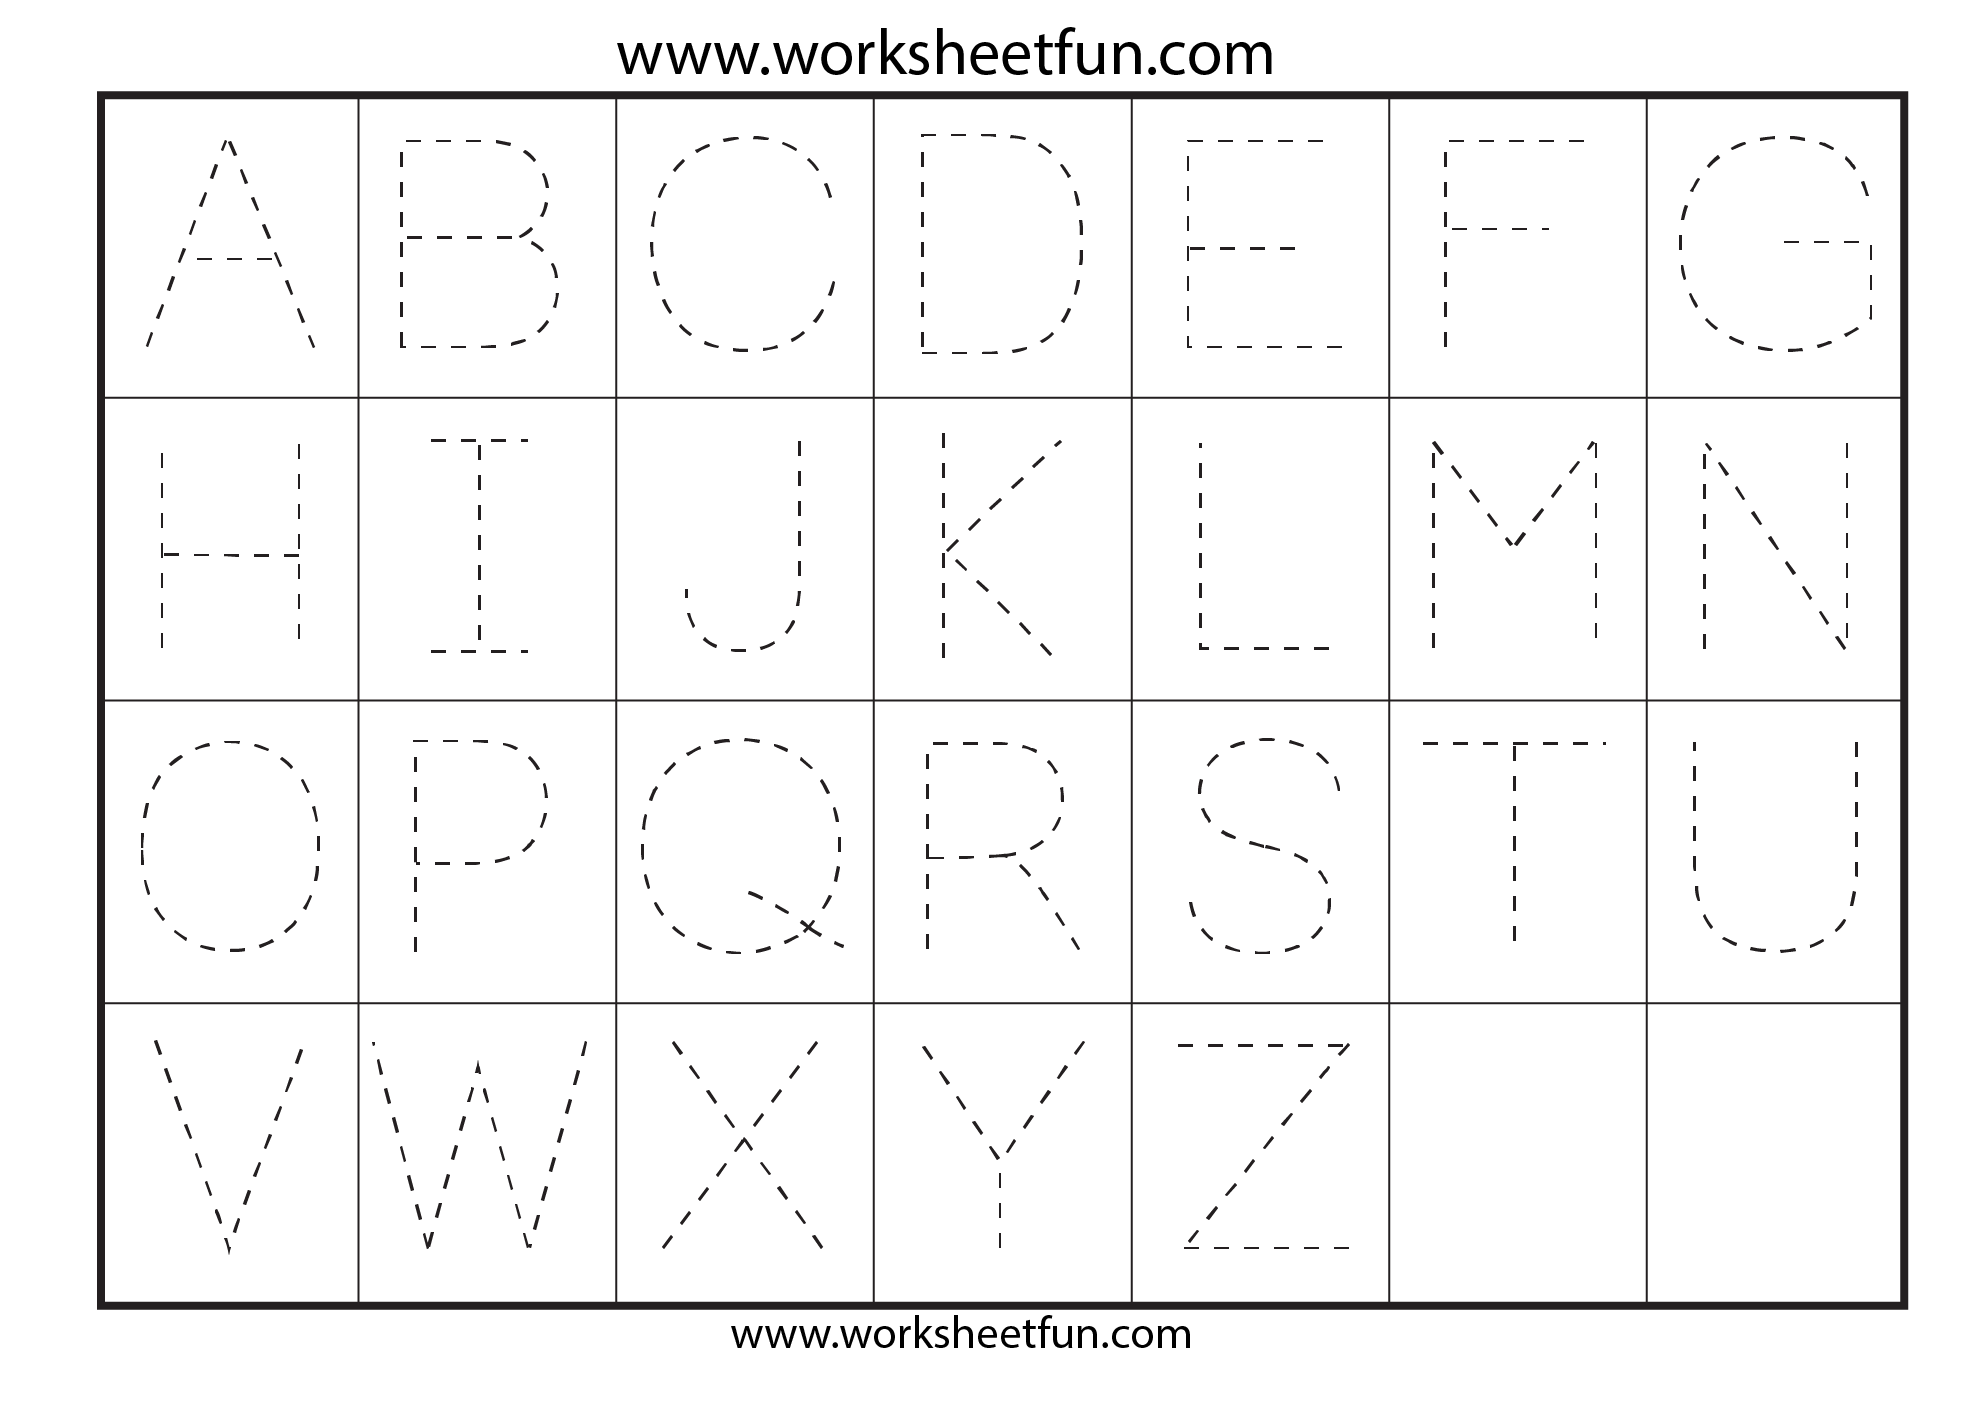 Trace Alphabet Worksheets Az The Best Worksheets Image Collection